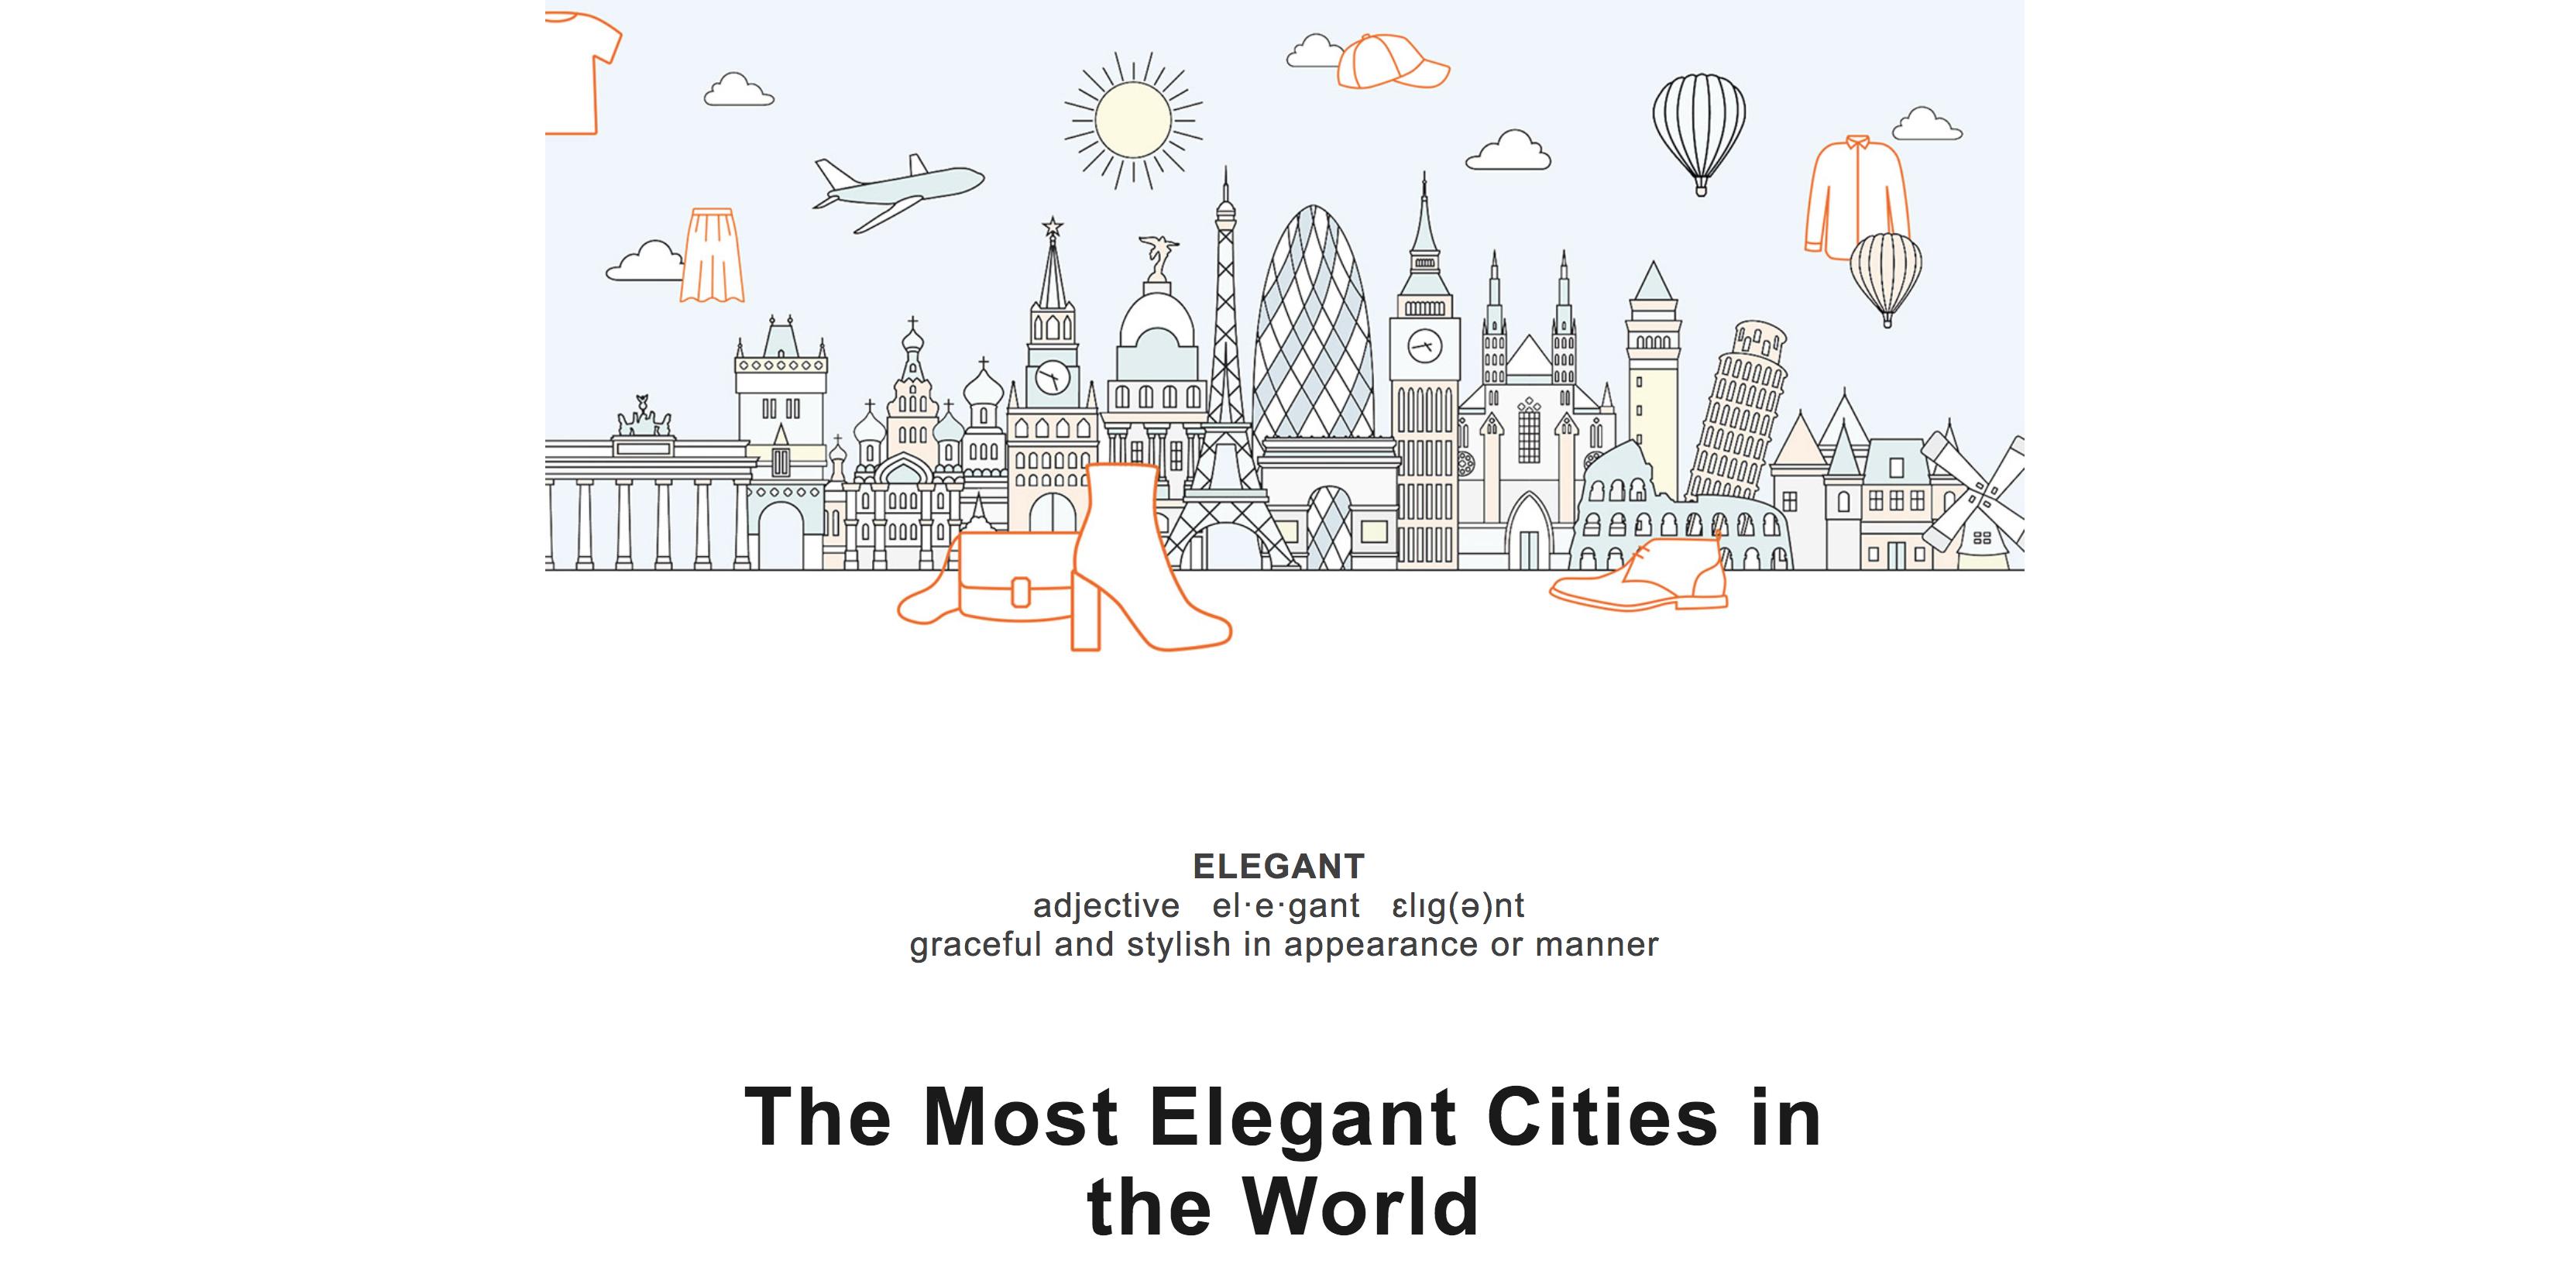 Example of Zalando's most elegant cities